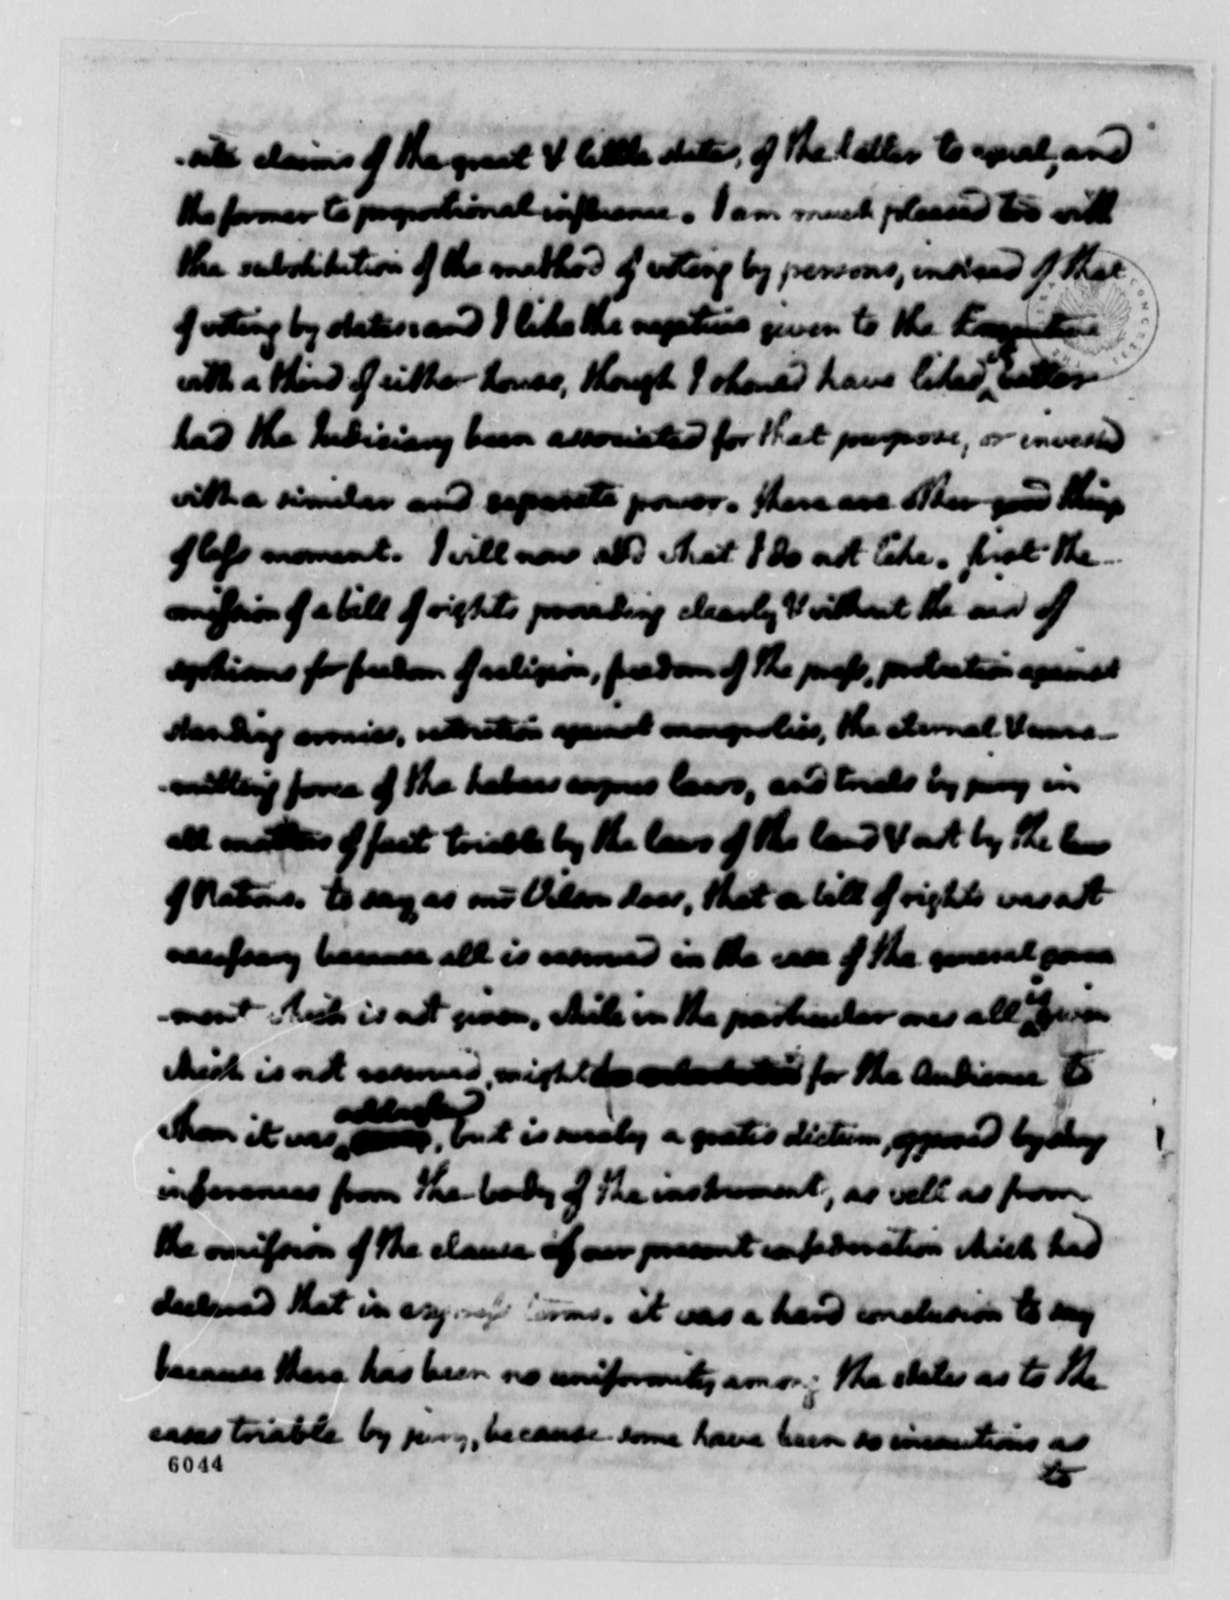 Thomas Jefferson to James Madison, December 20, 1787